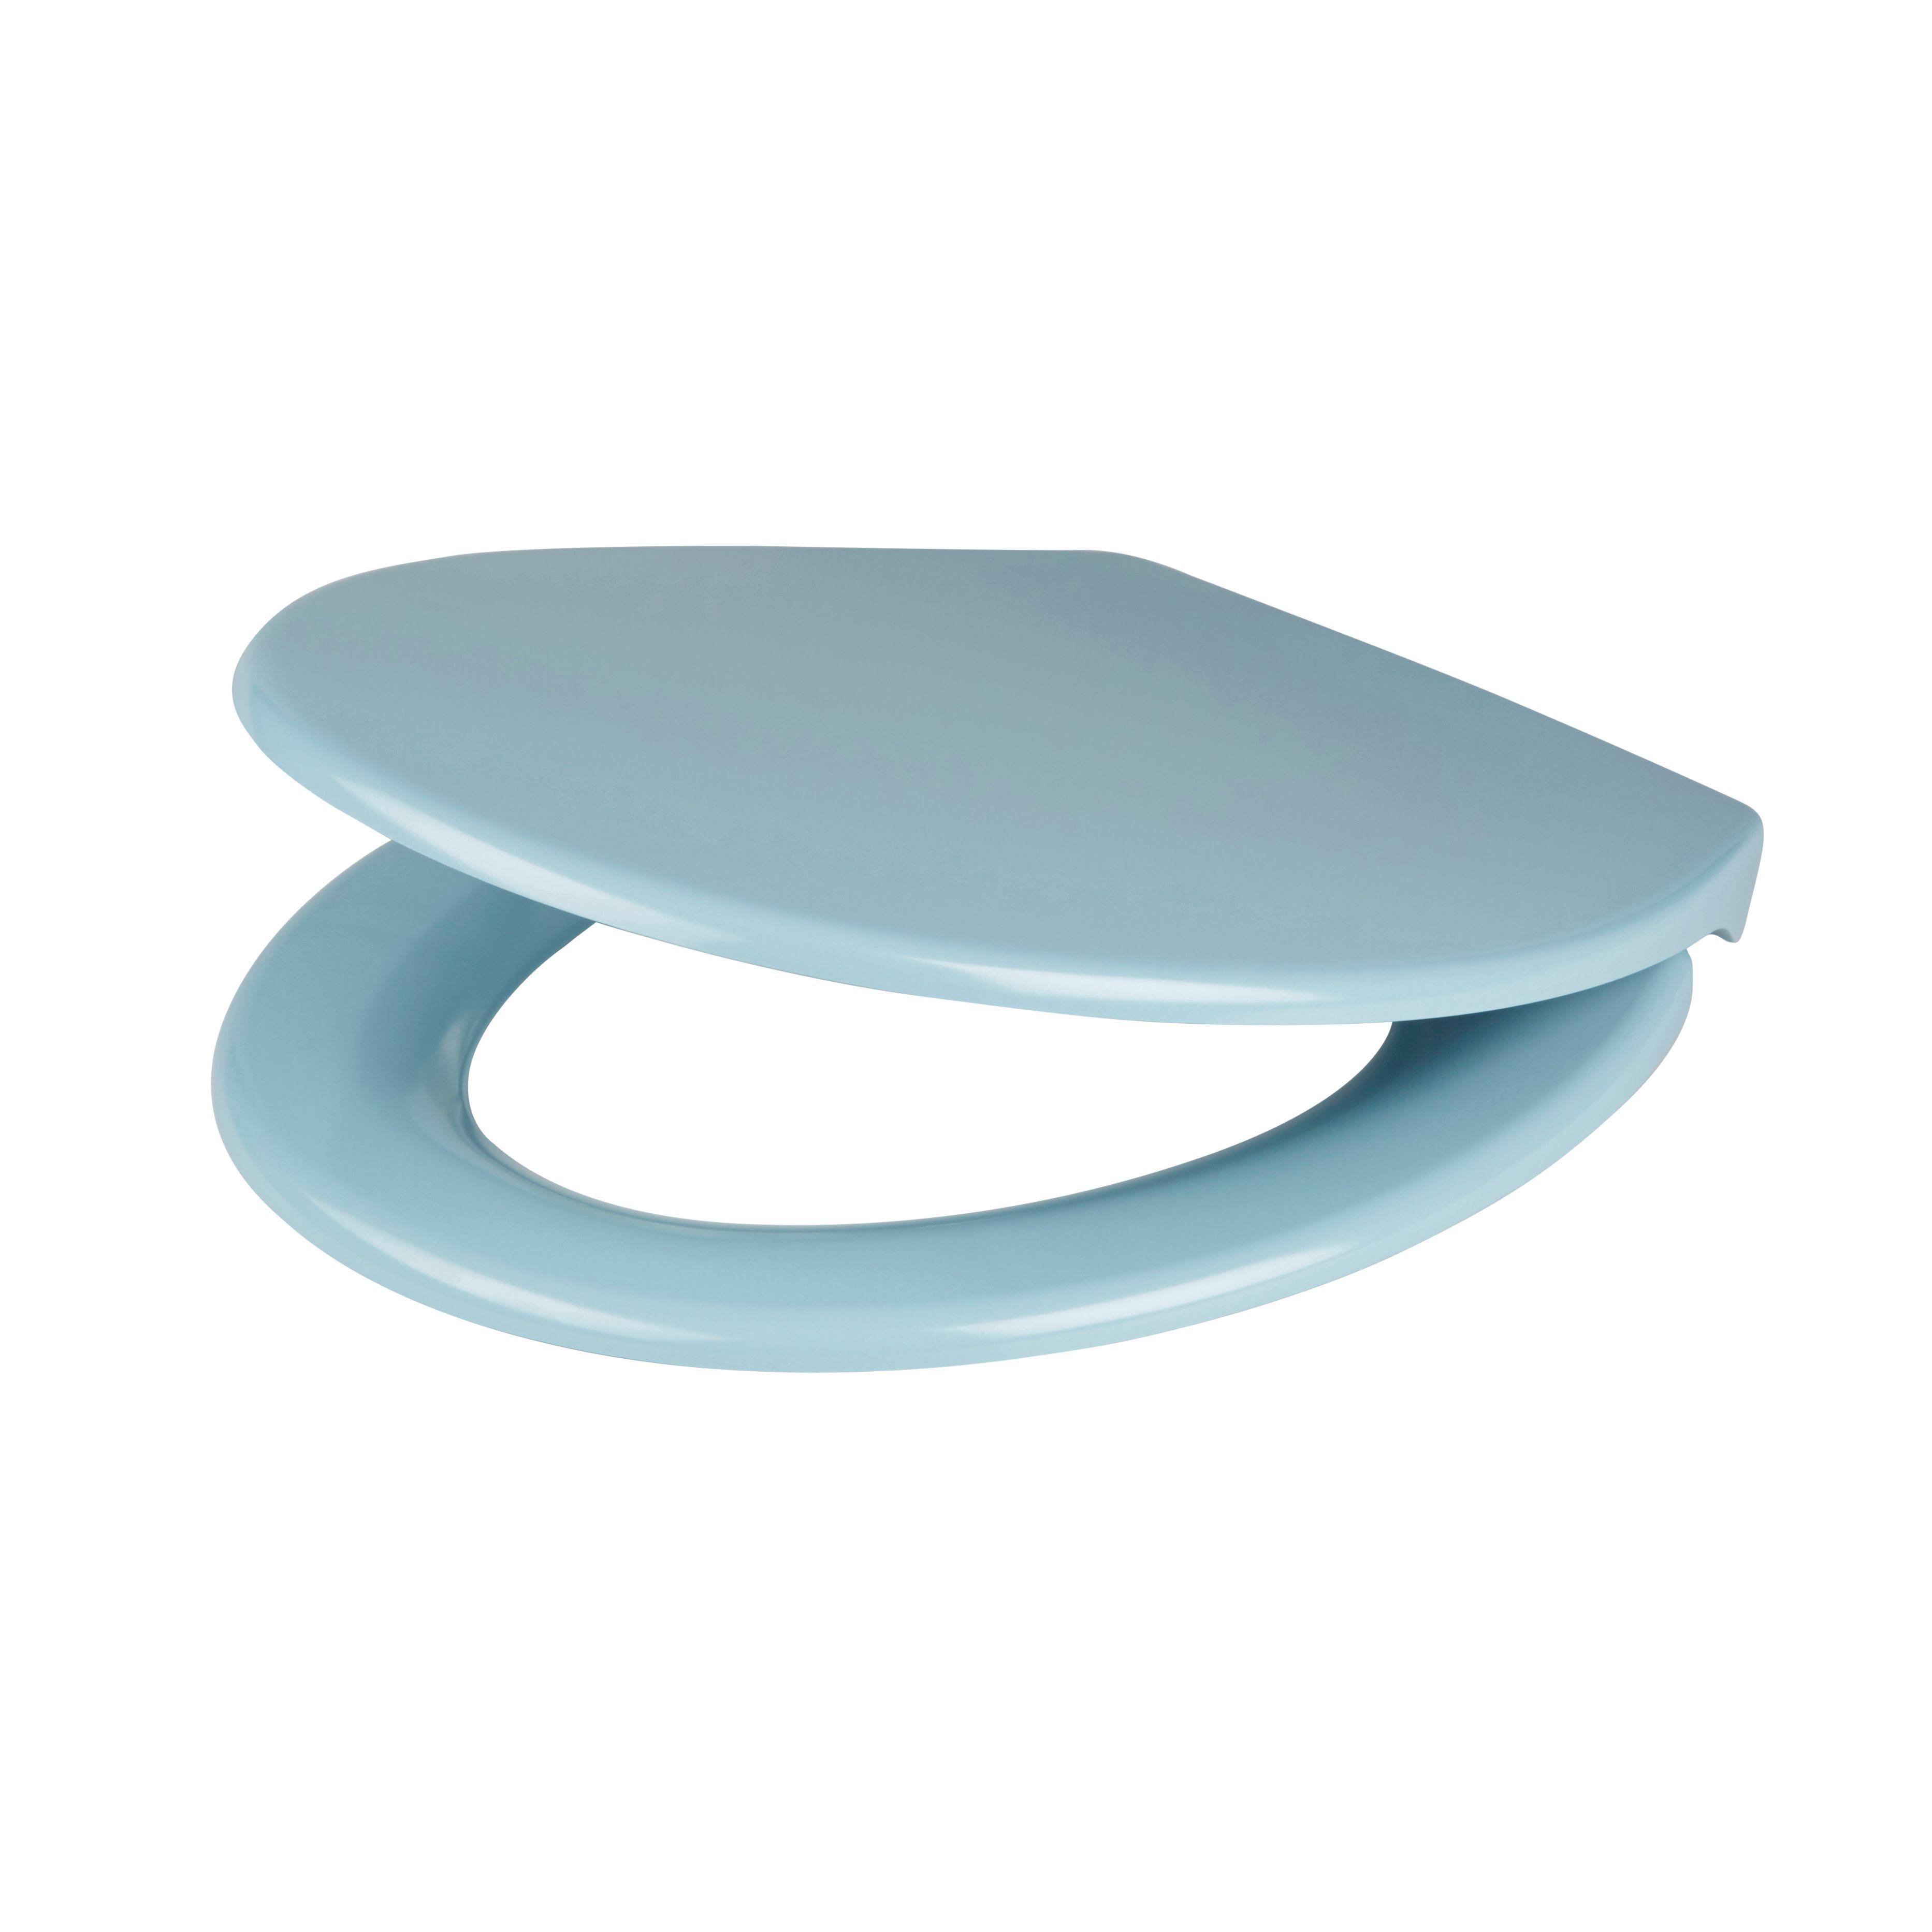 Cooke & Lewis Diani Blue Top-Fix Soft Close Toilet Seat | Rooms ...